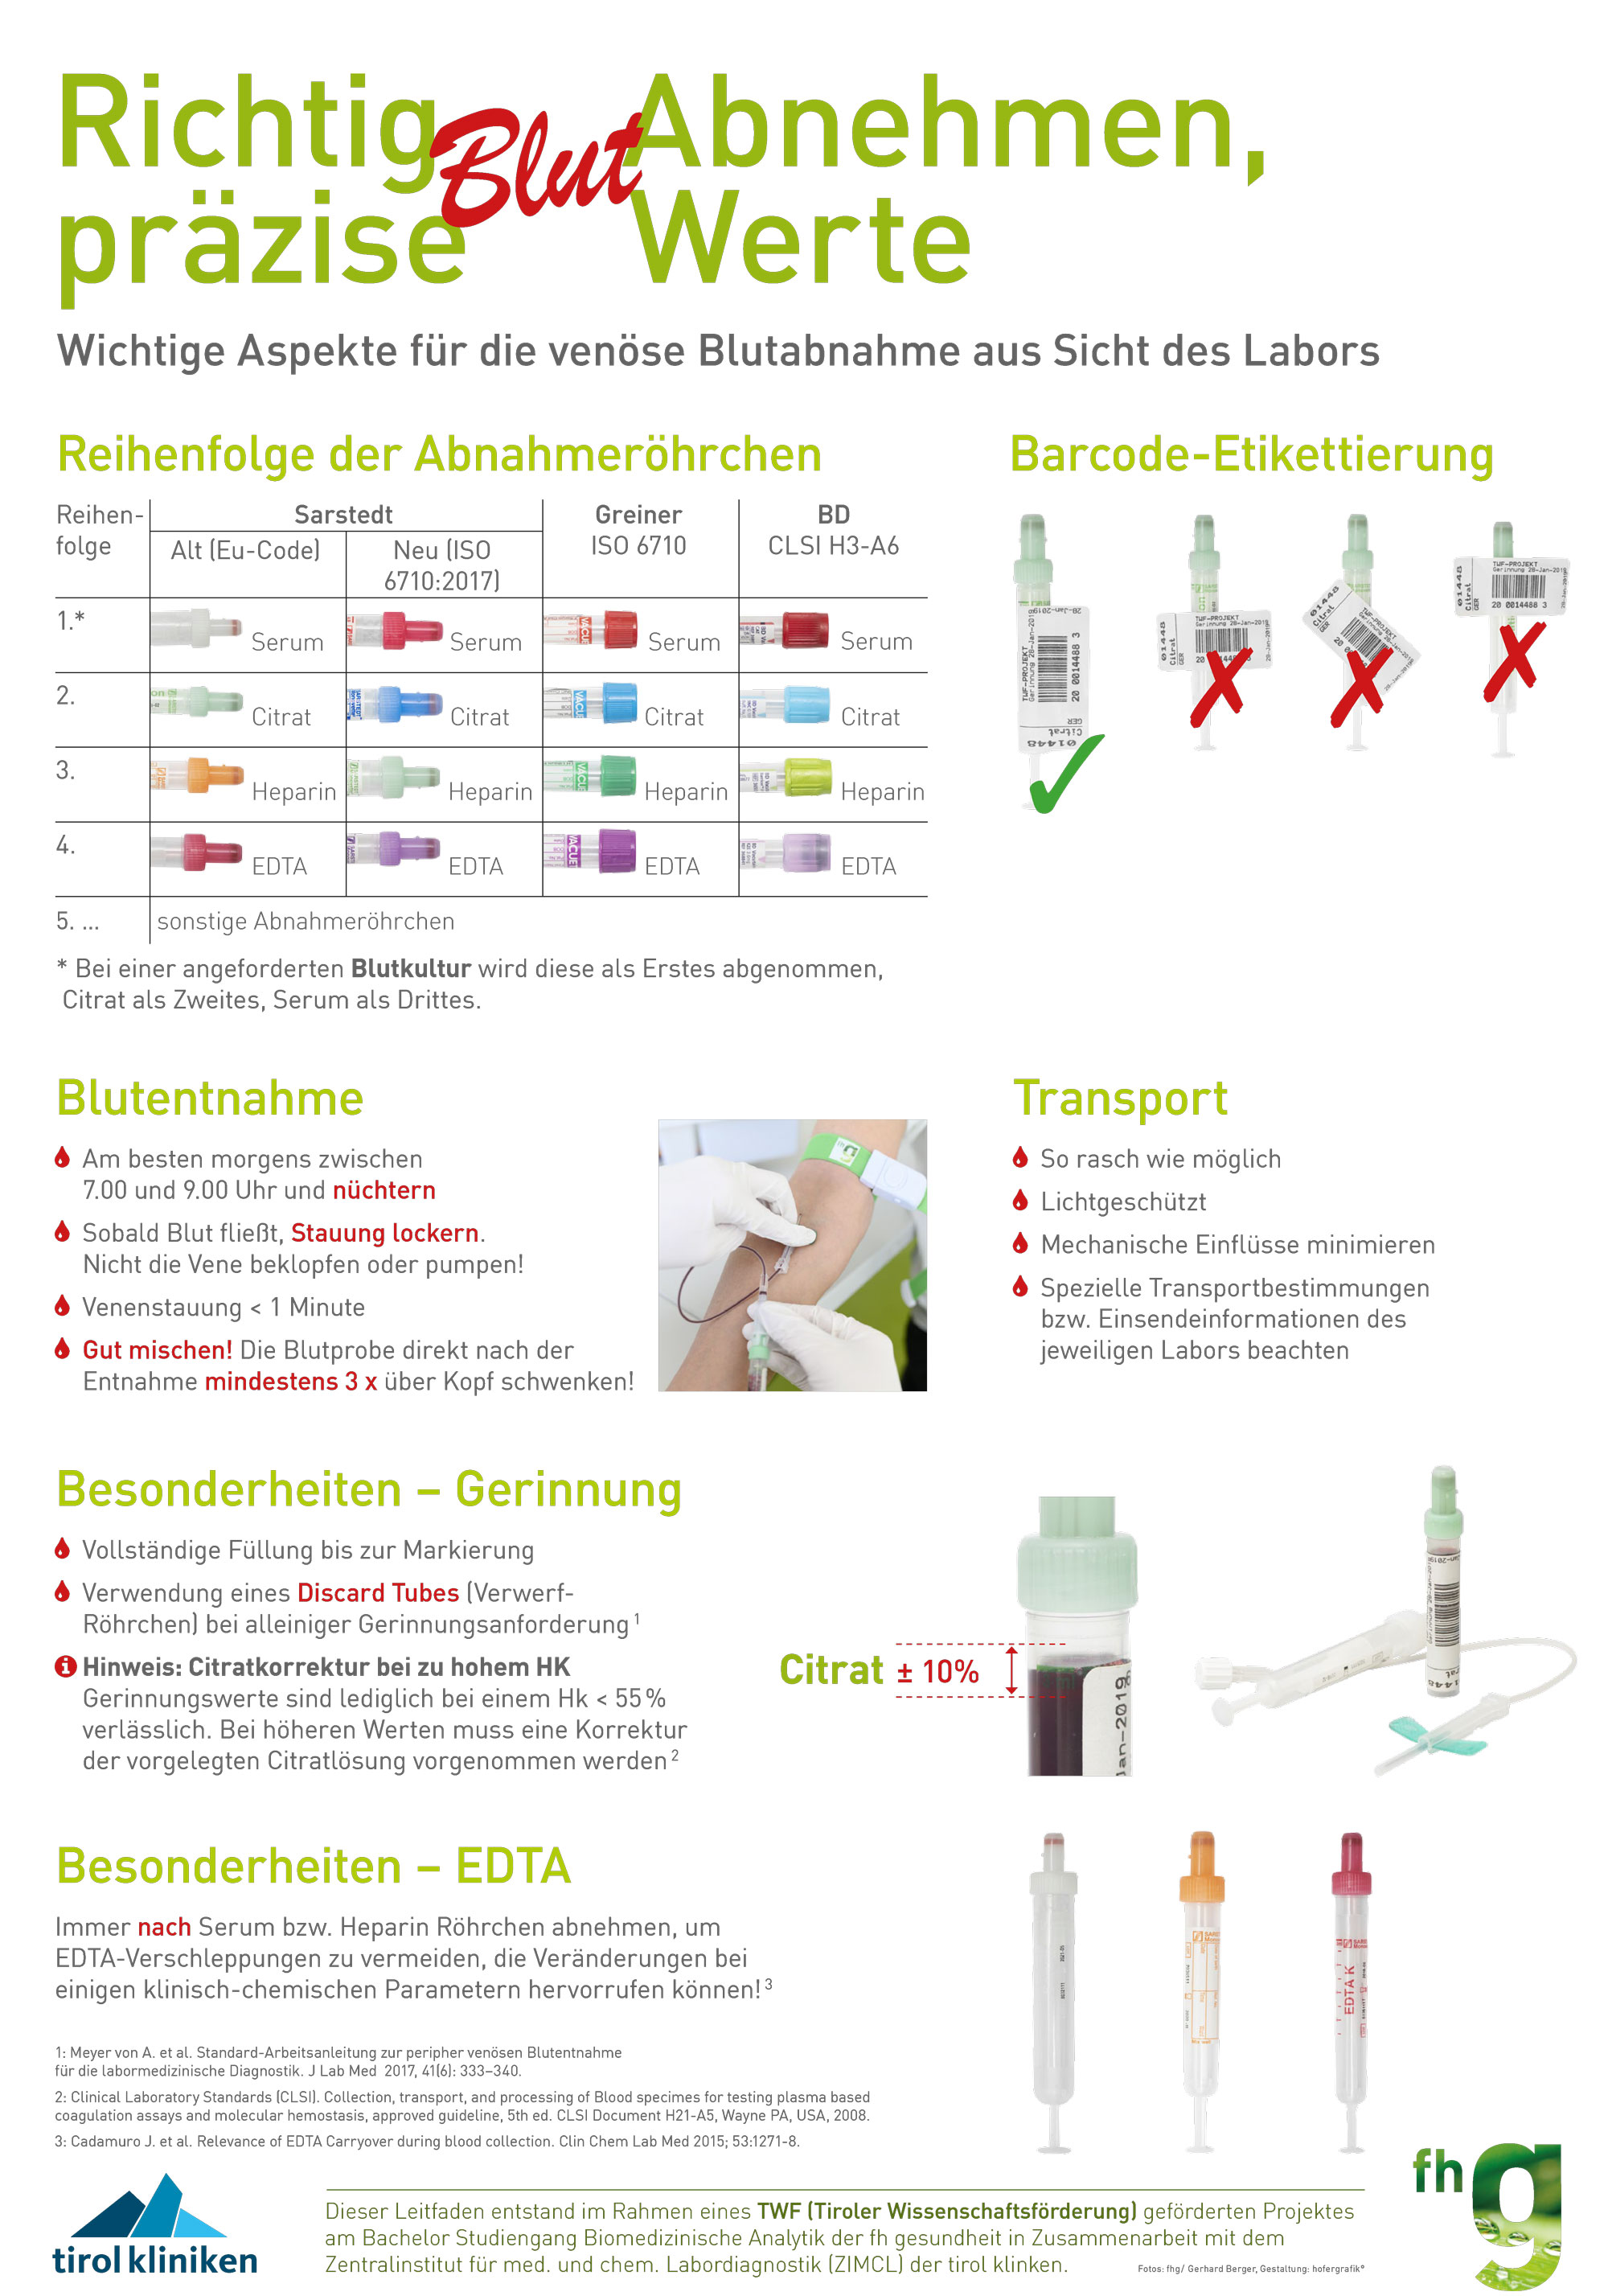 Plakat zum Thema Blut abnehmem